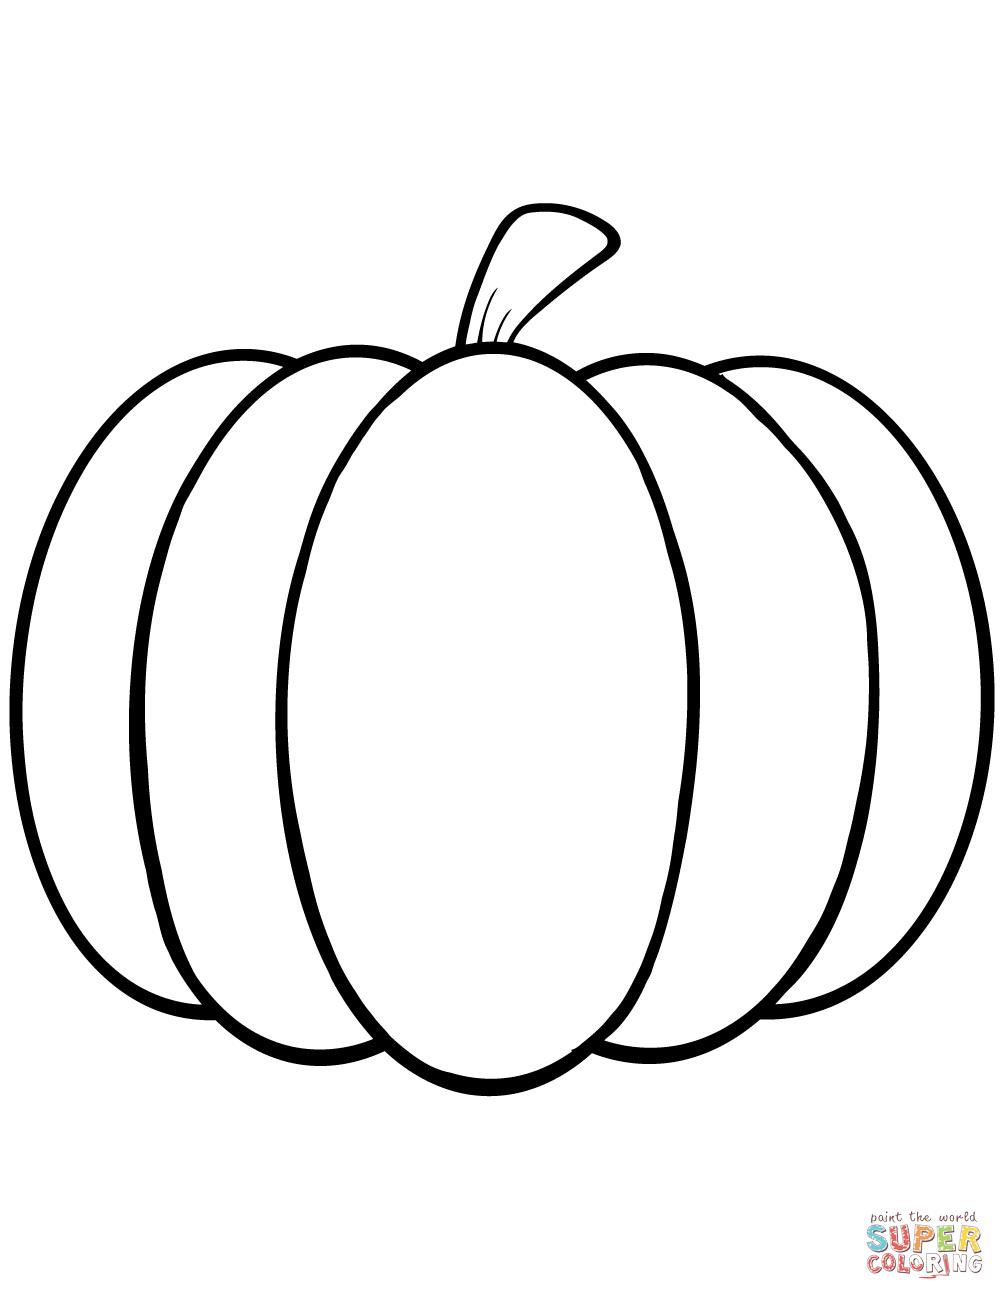 Simple Pumpkin Coloring Page Free Printable Coloring Pages Pumpkin Coloring Sheet Pumpkin Coloring Pages Fall Coloring Pages